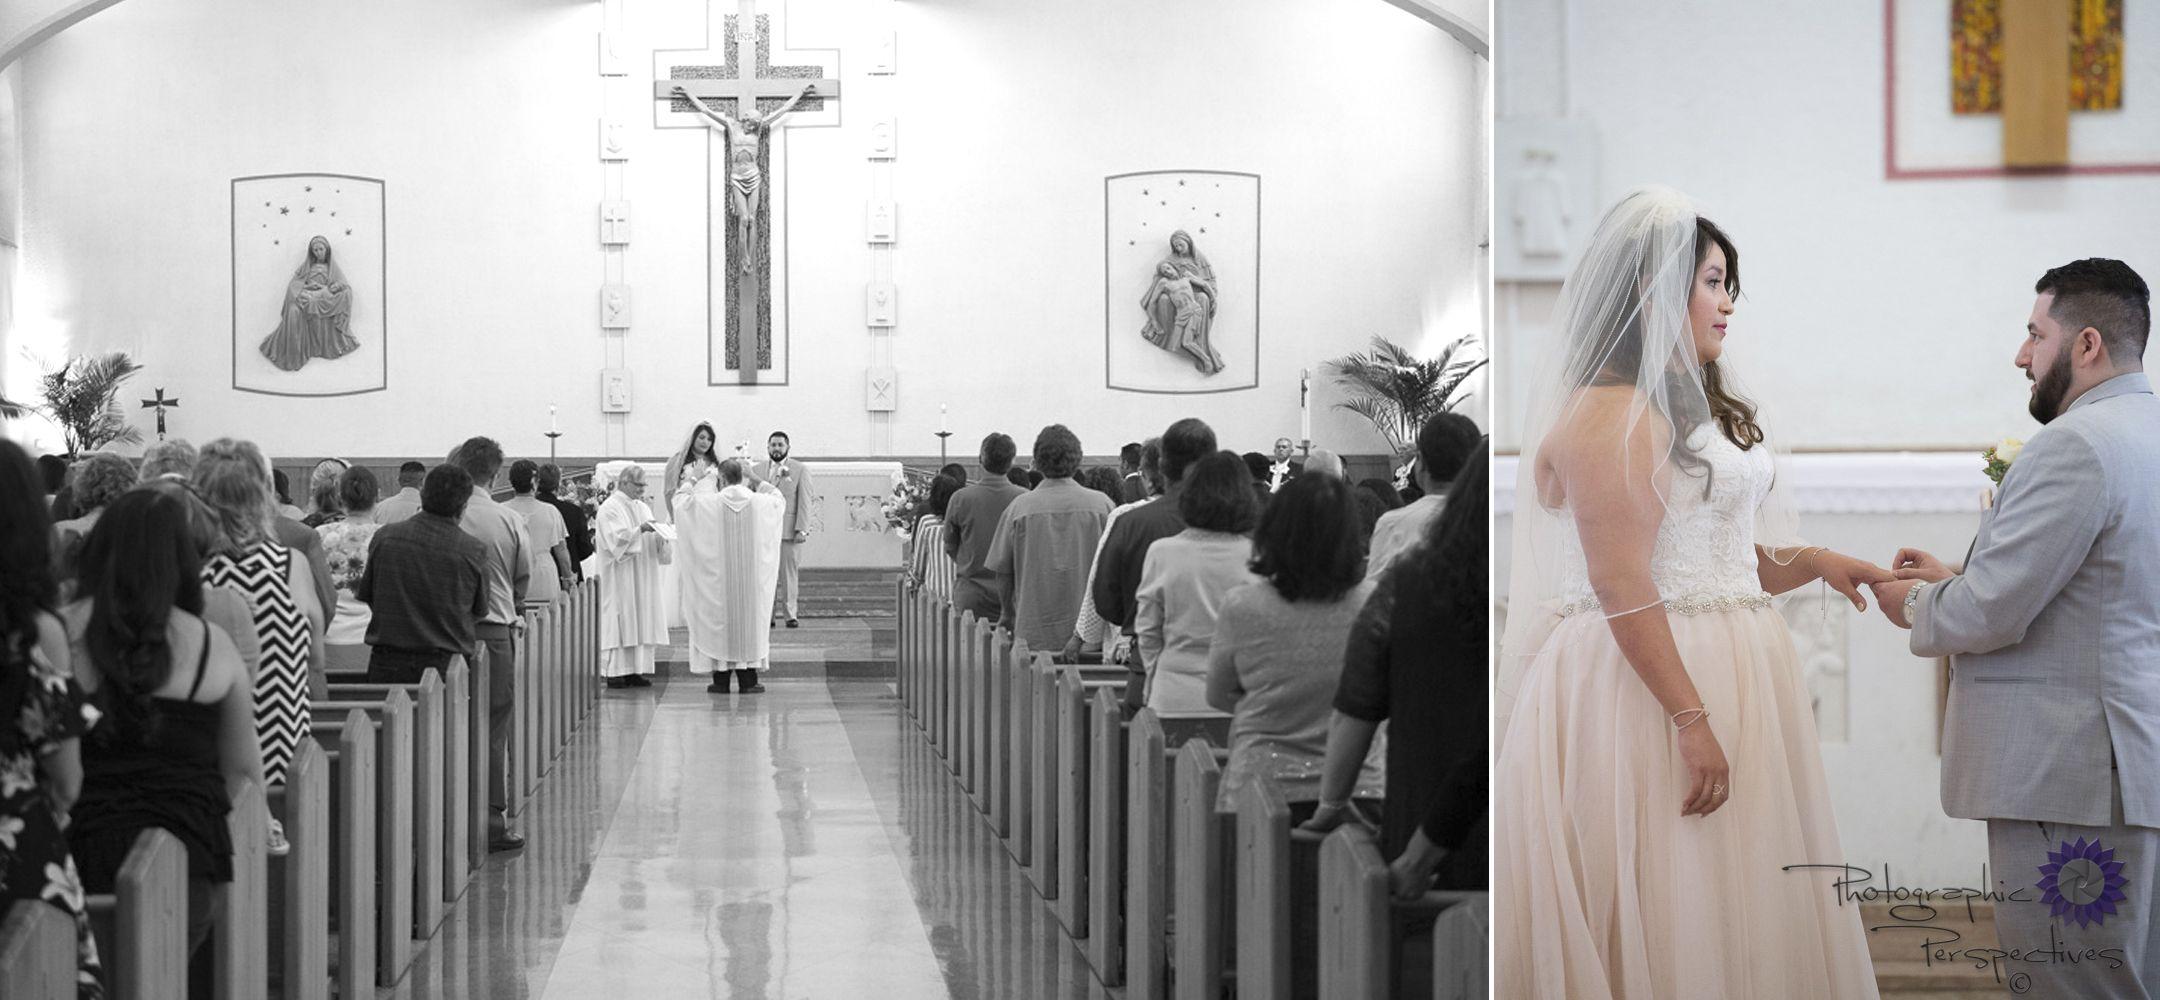 St. Therese Catholic Church Wedding Ceremony Albuquerque